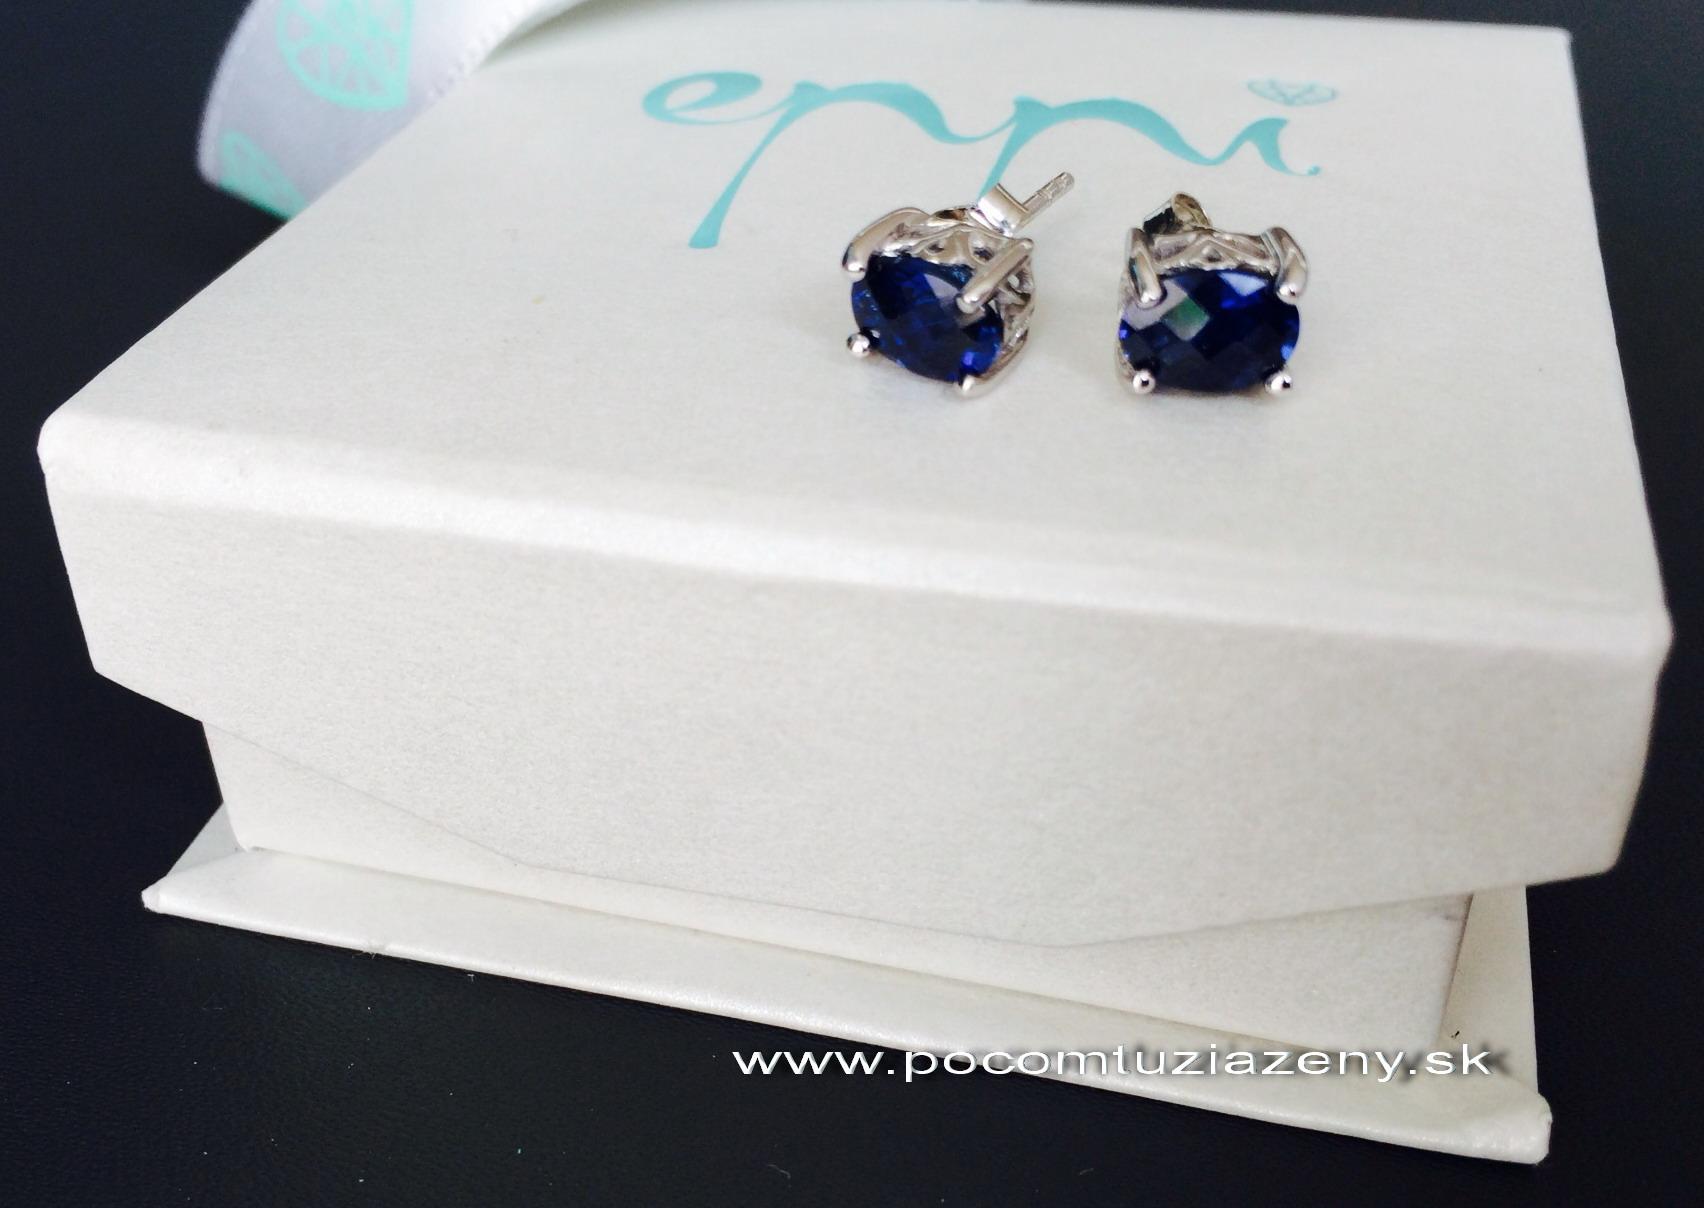 d4252447b fashionblog-blog-o-mode-nausnice-strieborne-zafirove-elegantne